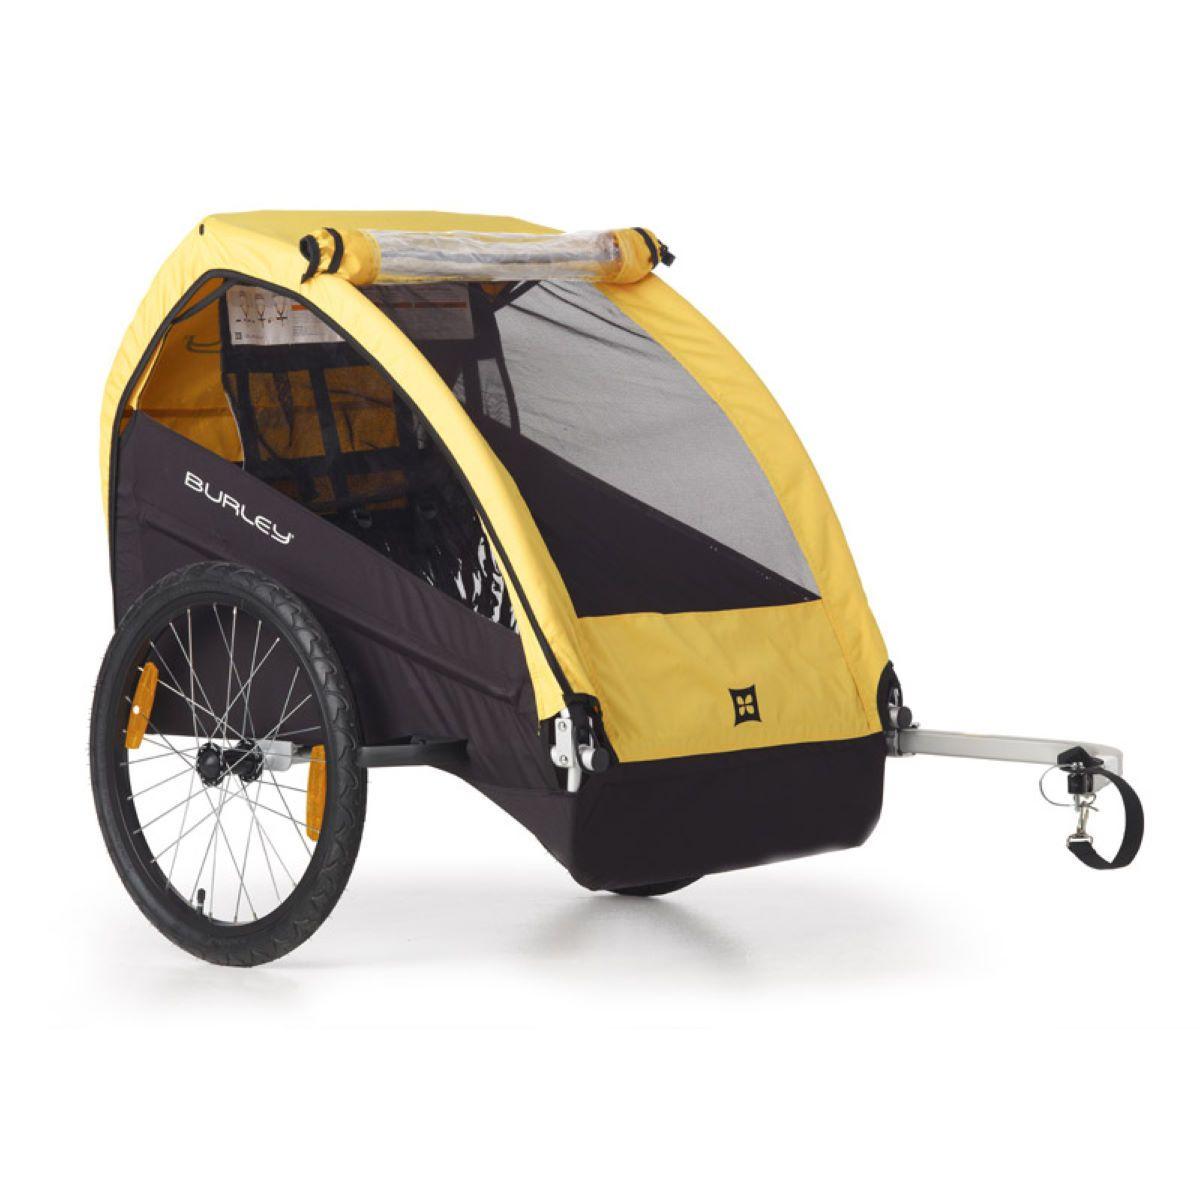 Wiggle Burley Bee Bike Trailer Trailers